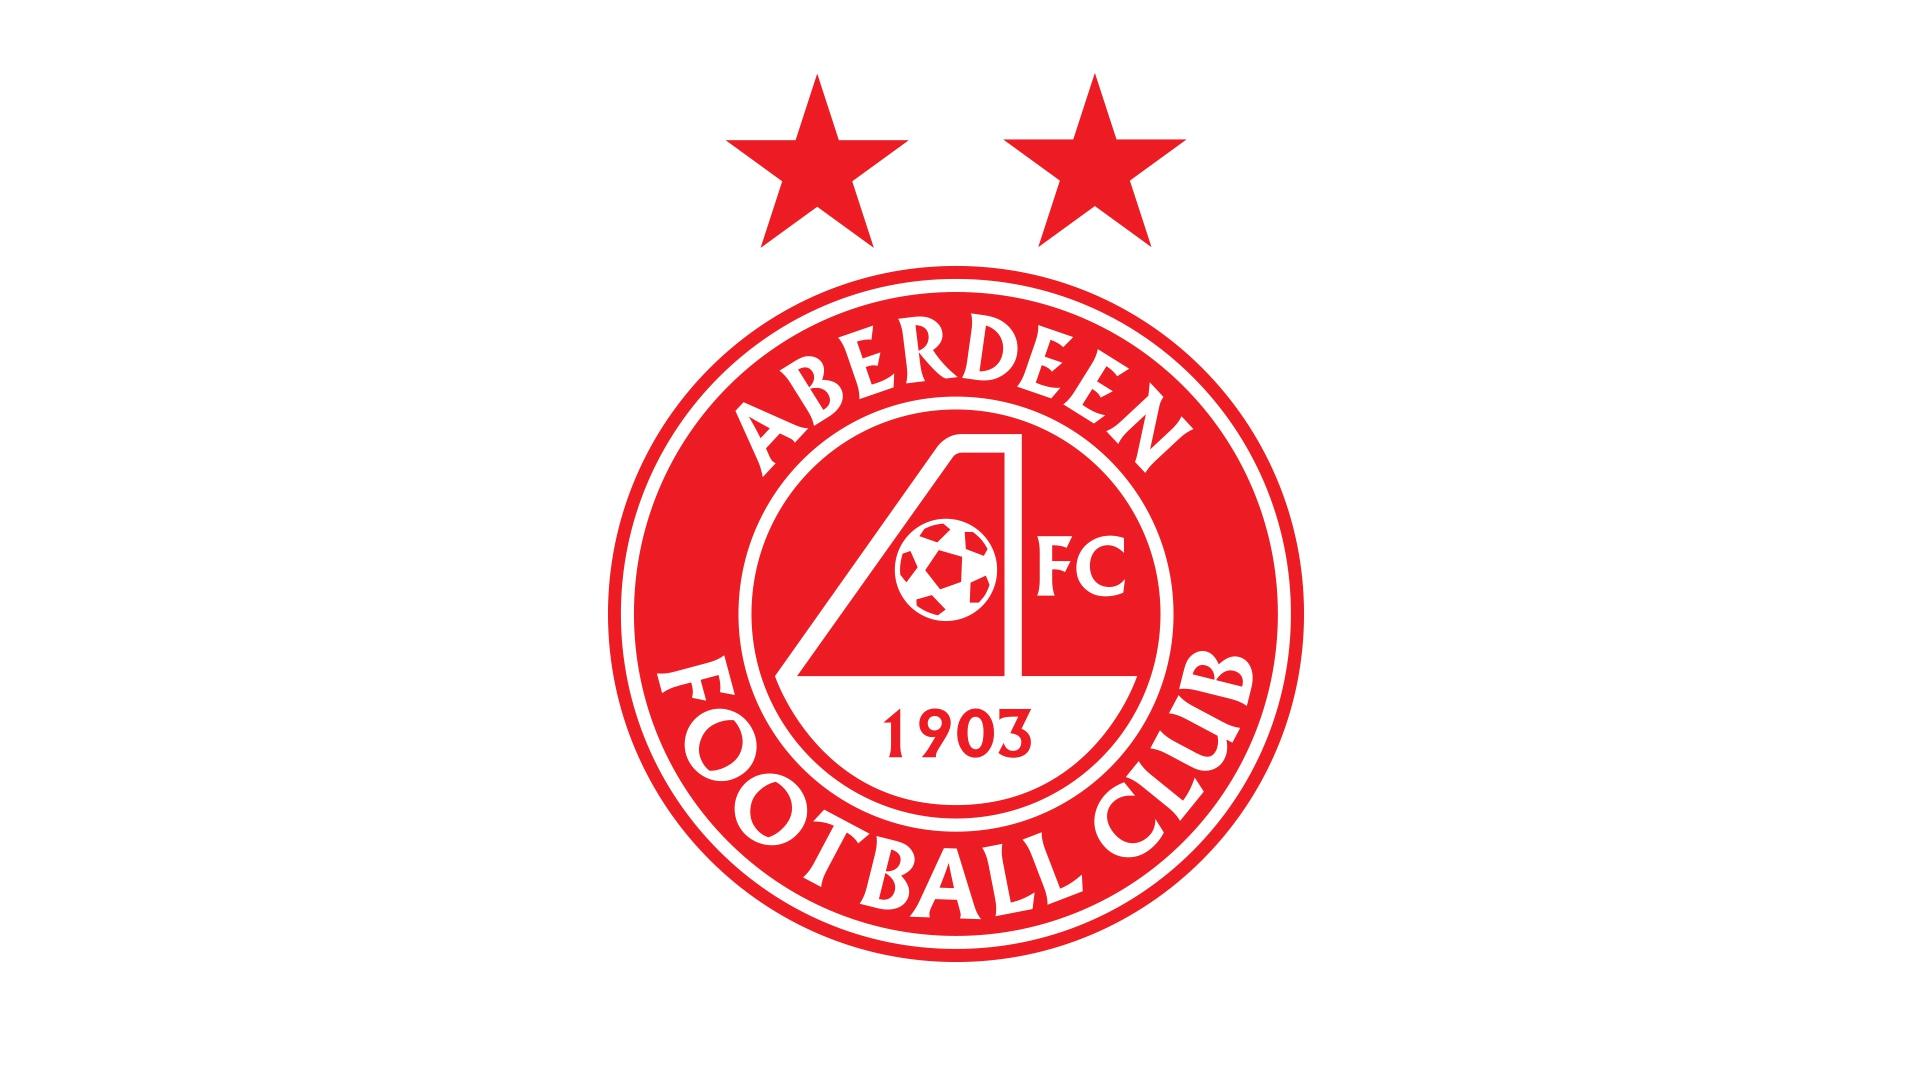 Aberdeen Fc Aberdeen Fc And Atlanta United Enter Into Strategic Partnership